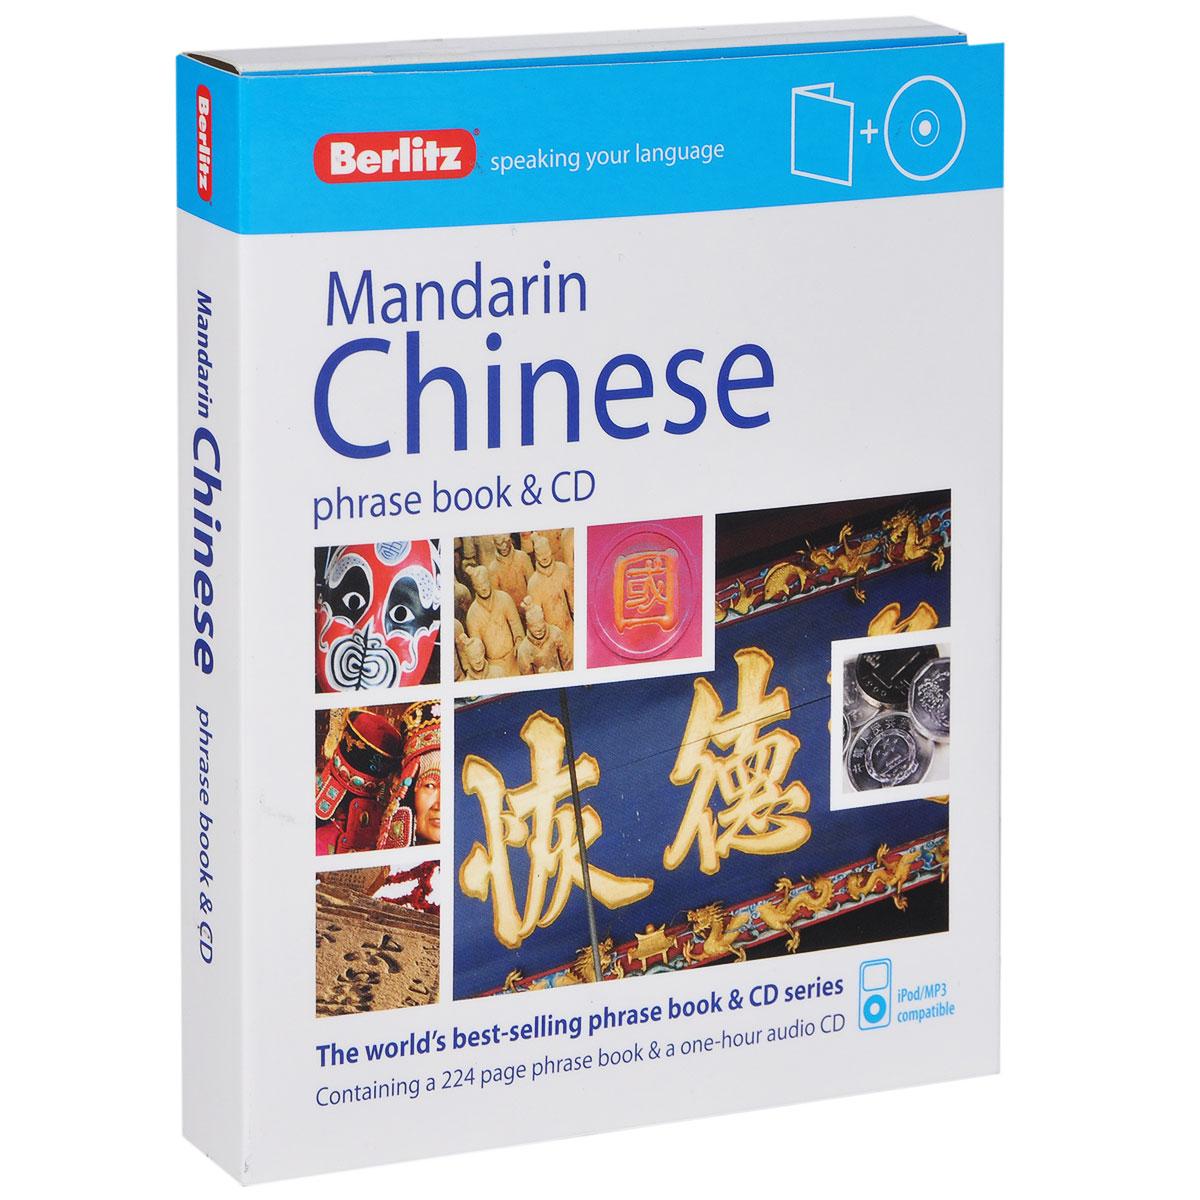 Mandarin Chinese Phrase Book (+ CD)